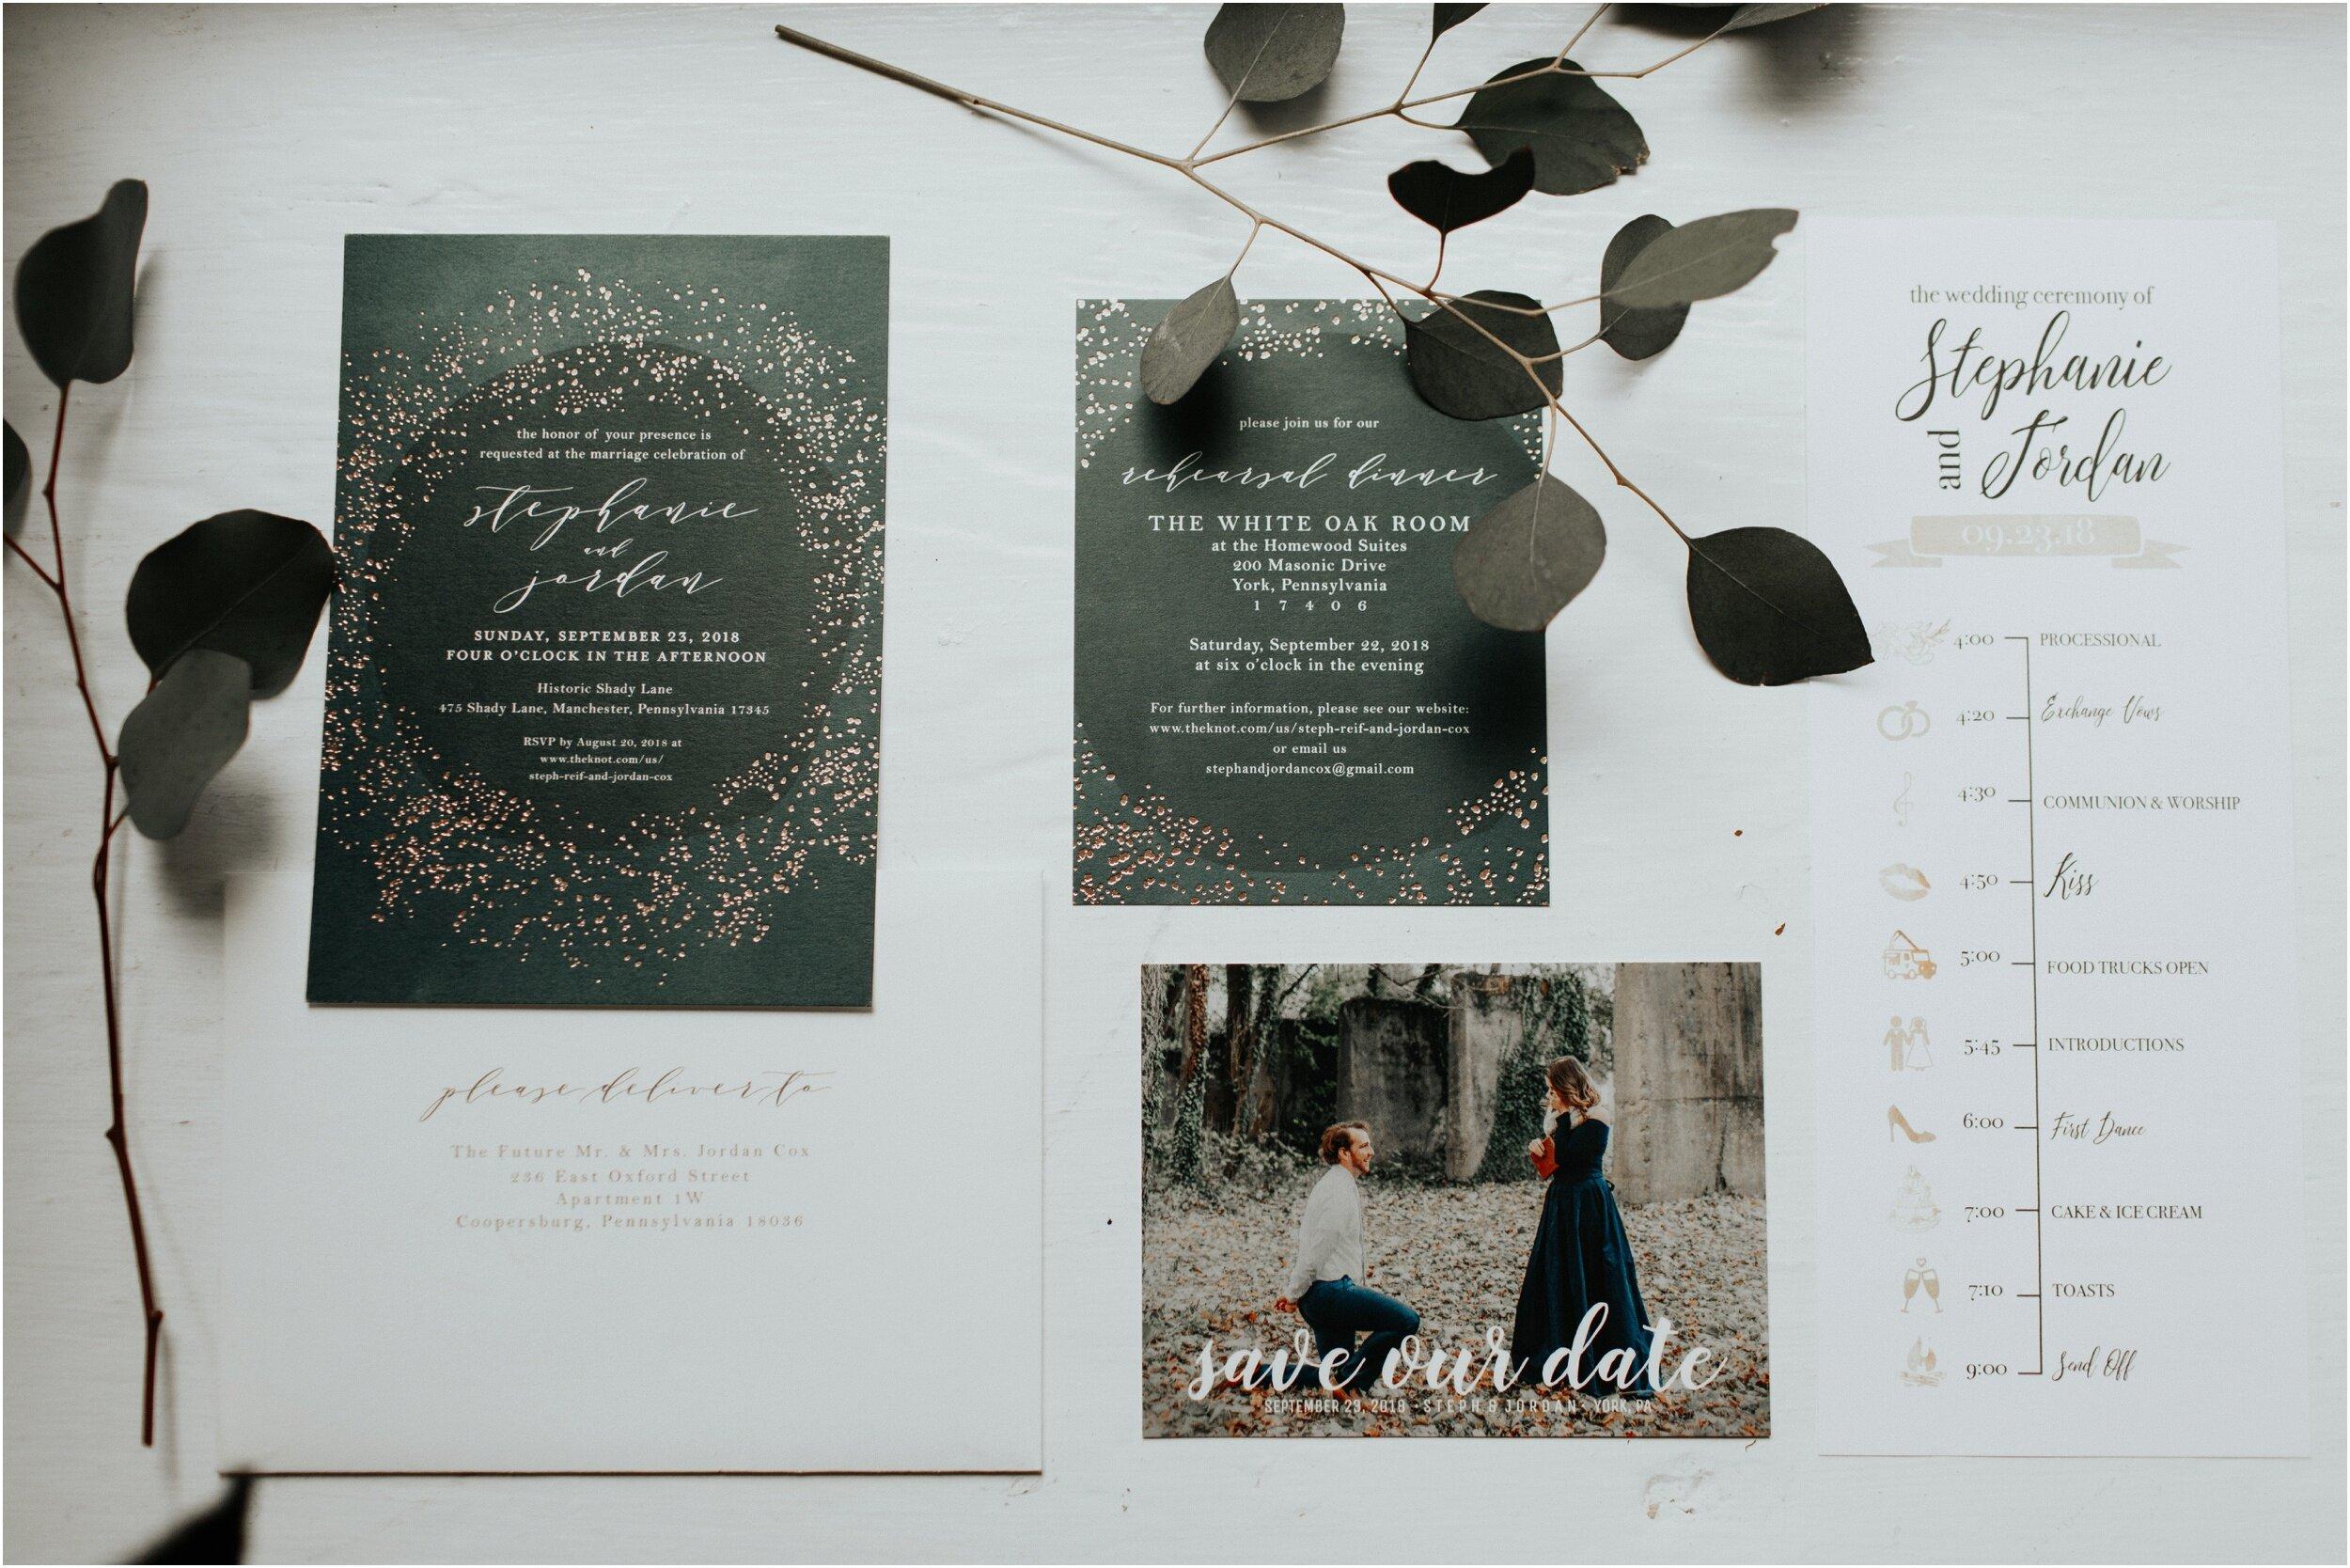 steph-and-jordan-cox-our-wedding-historic-shady-lane-compass-wedding-collective-hazel-lining-photography-destination-elopement-wedding-engagement-photography_0006.jpg